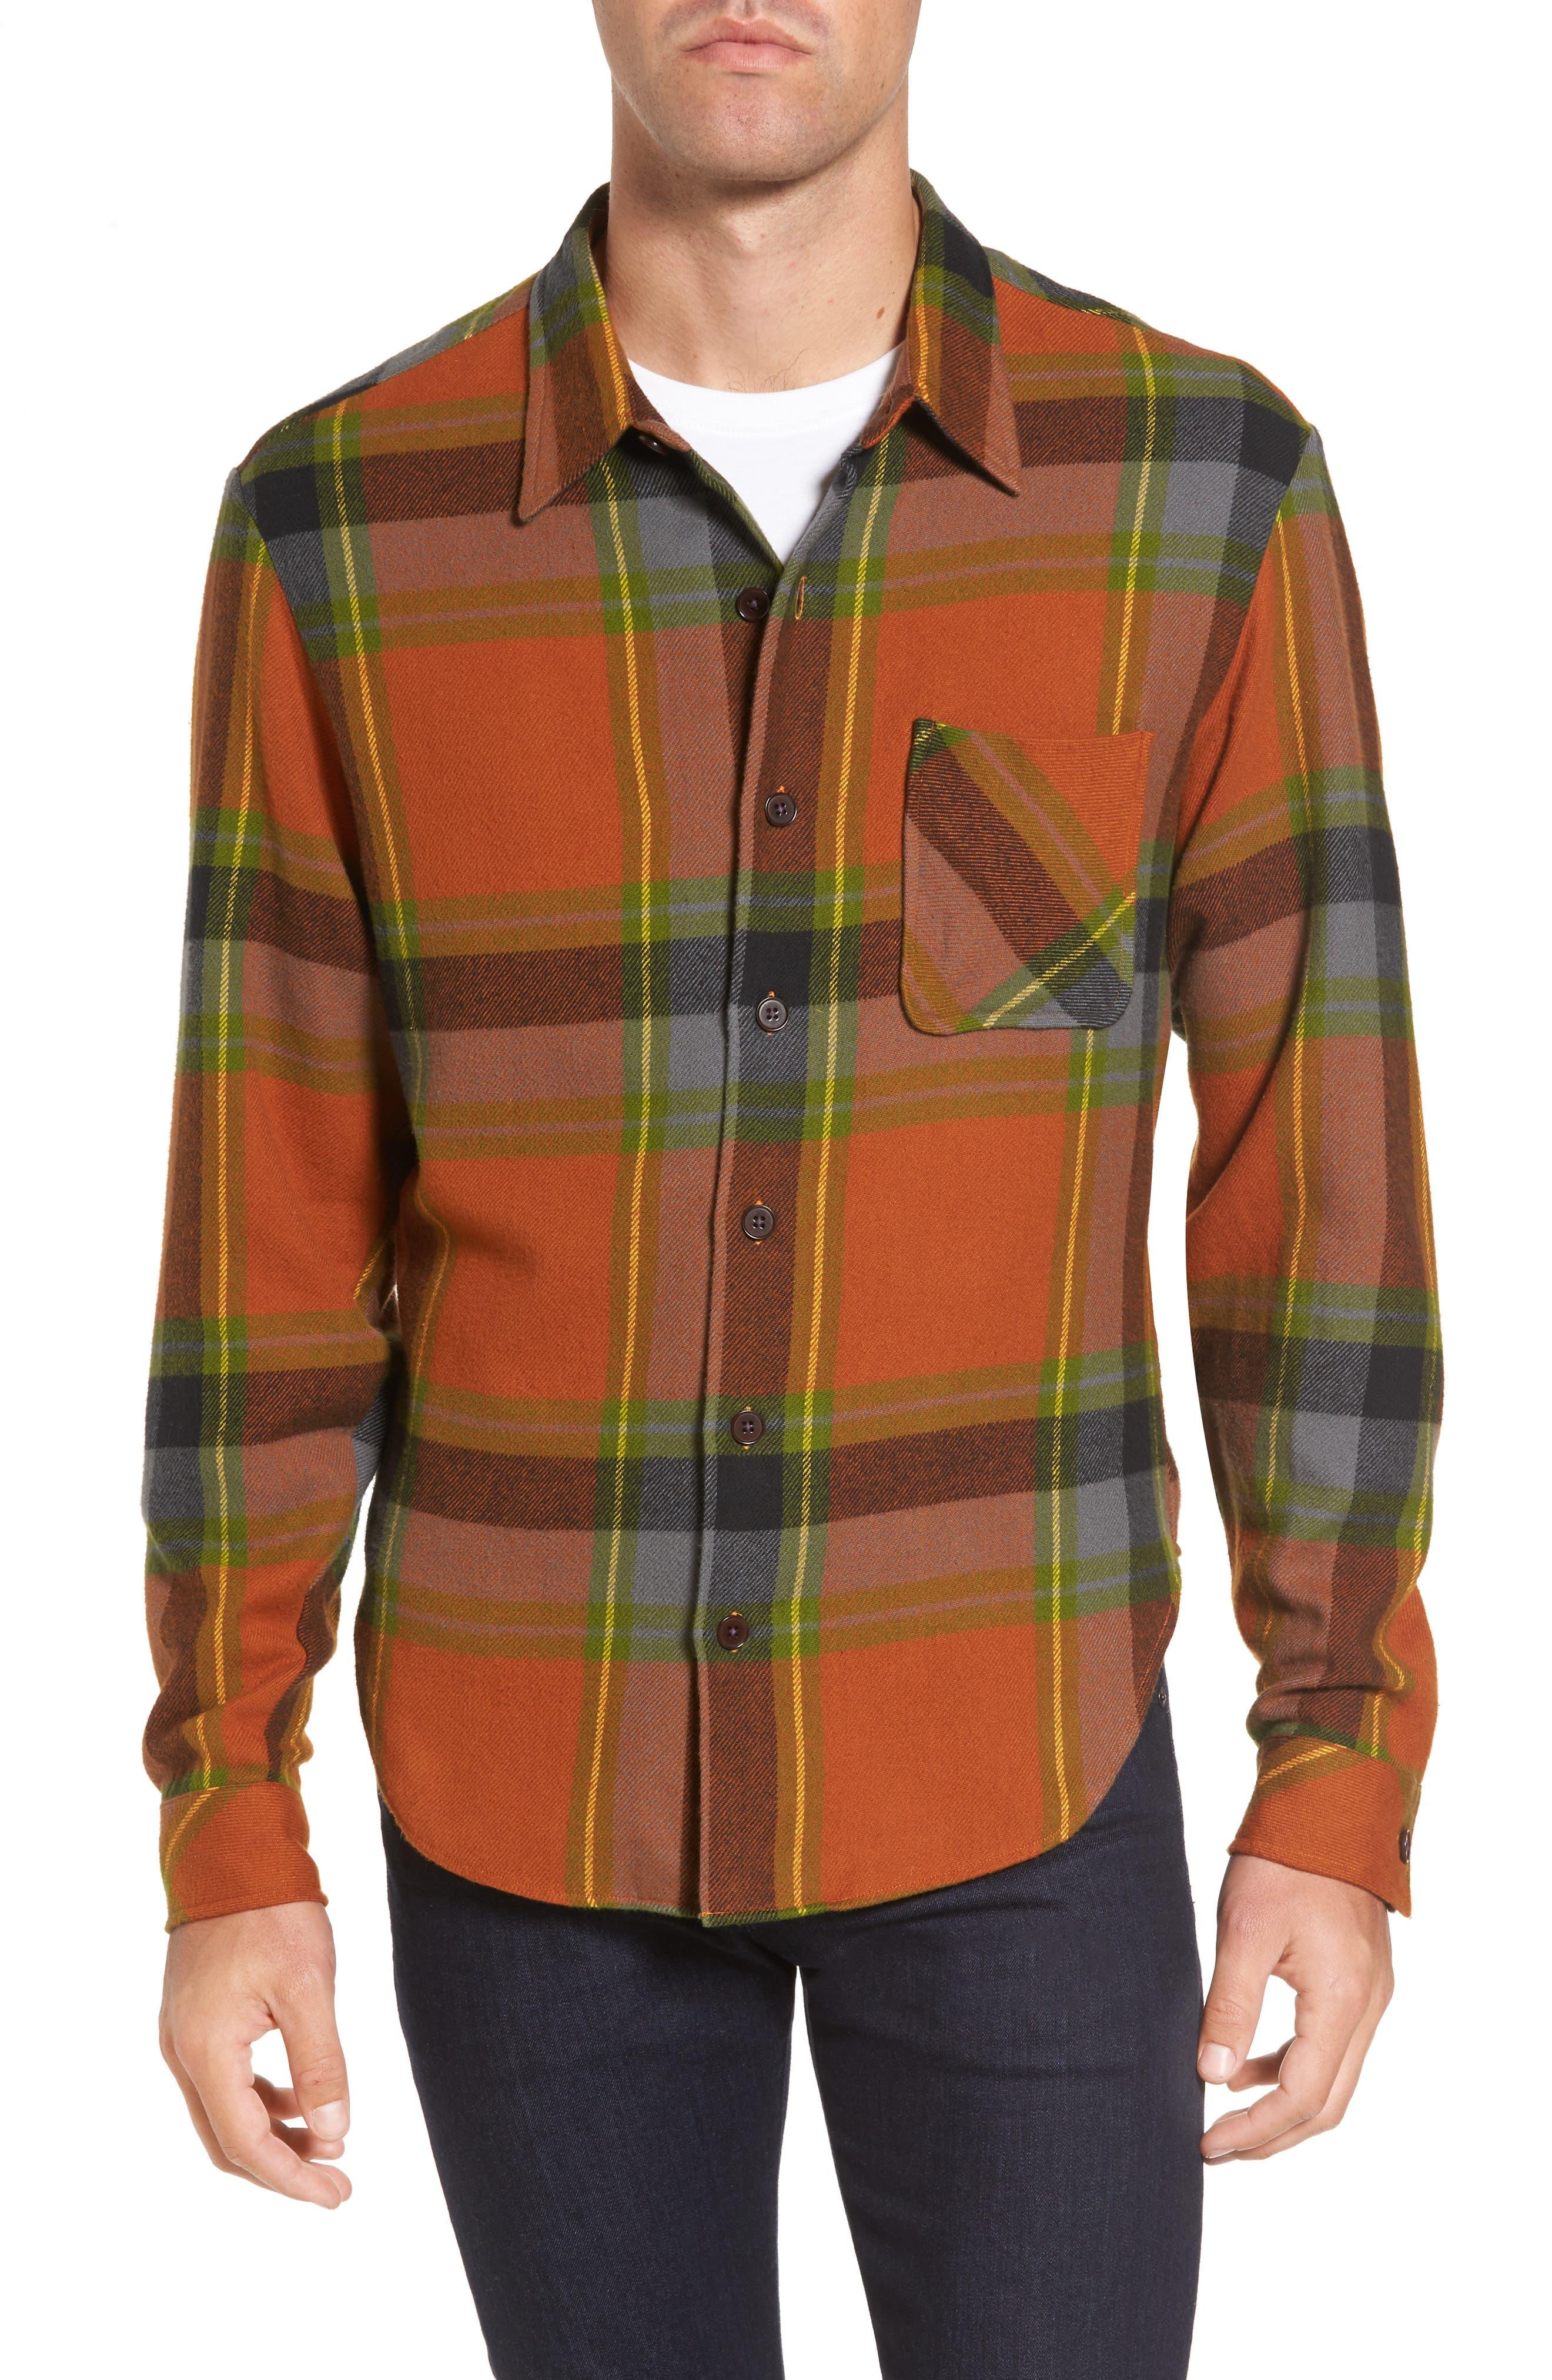 Alternate Image 1 Selected - Frame Denim Regular Fit Check Sport Shirt